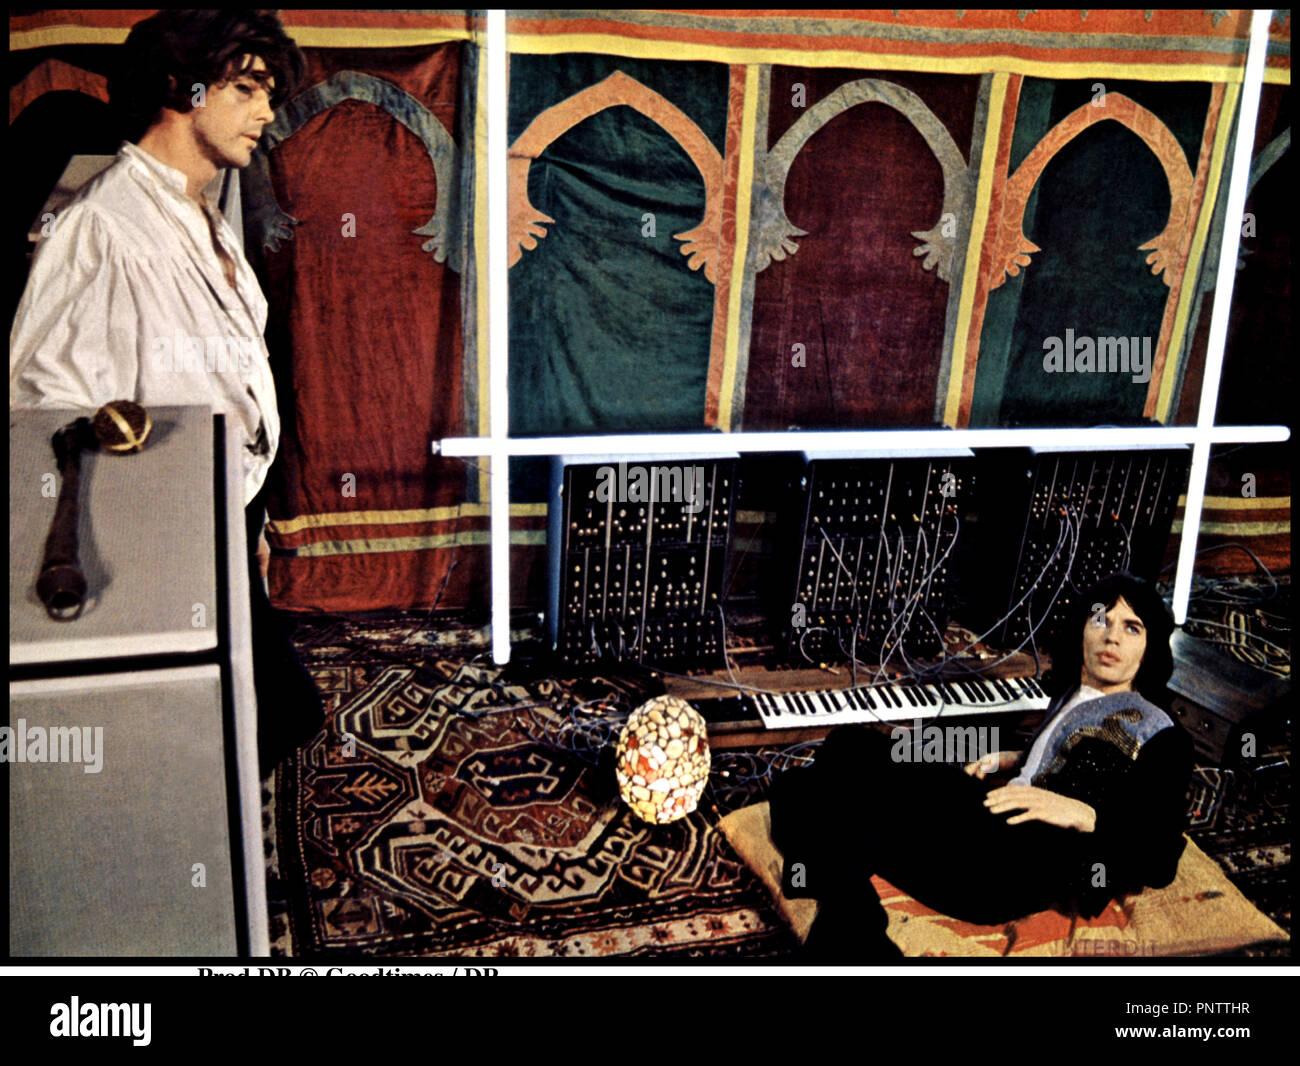 Prod DB © Goodtimes / DR PERFORMANCE (PERFORMANCE) de Donald Cammel et Nicolas Roeg 1970 GB avec Mick Jagger synthŽtiseur, salon oriental - Stock Image